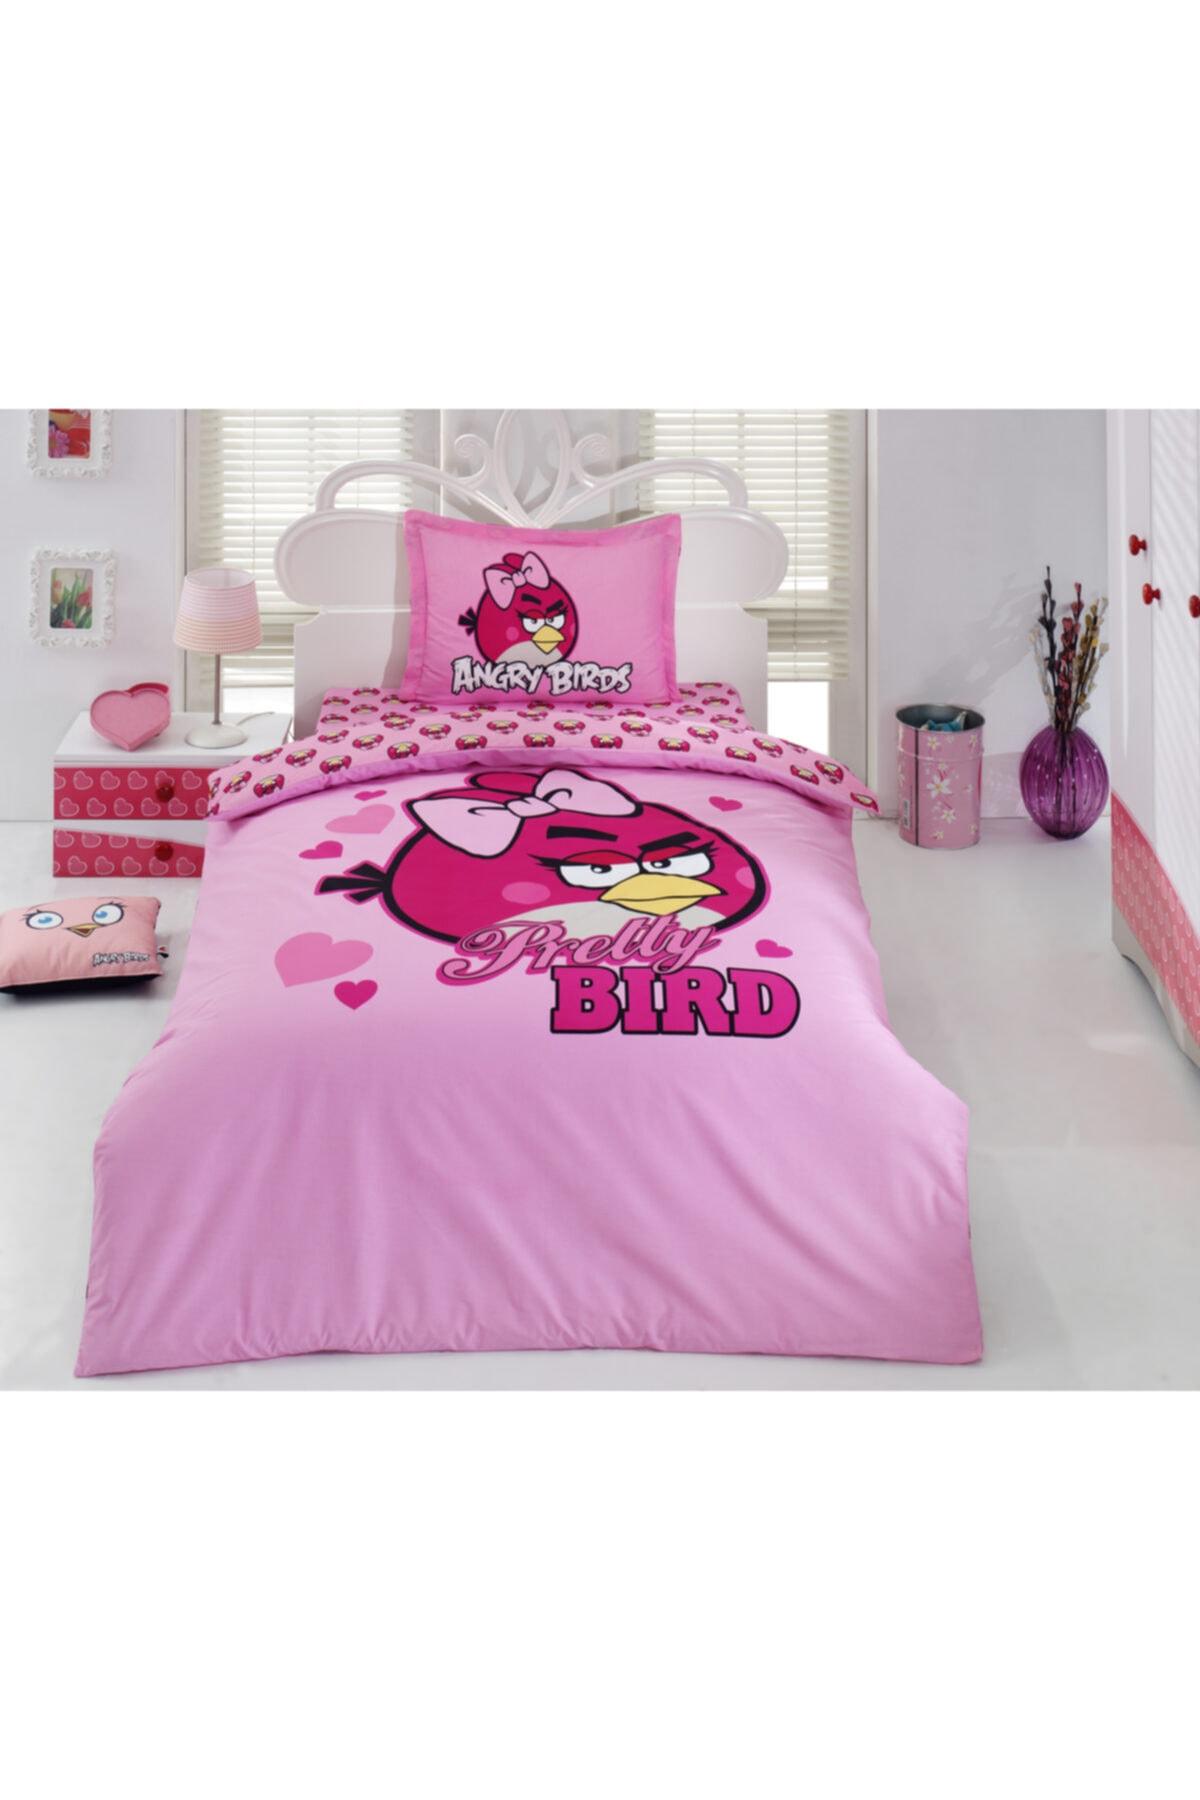 Angry Birds Angry Bırds Ranforce Pamuklu Nevresim Takımı Ab-08 1